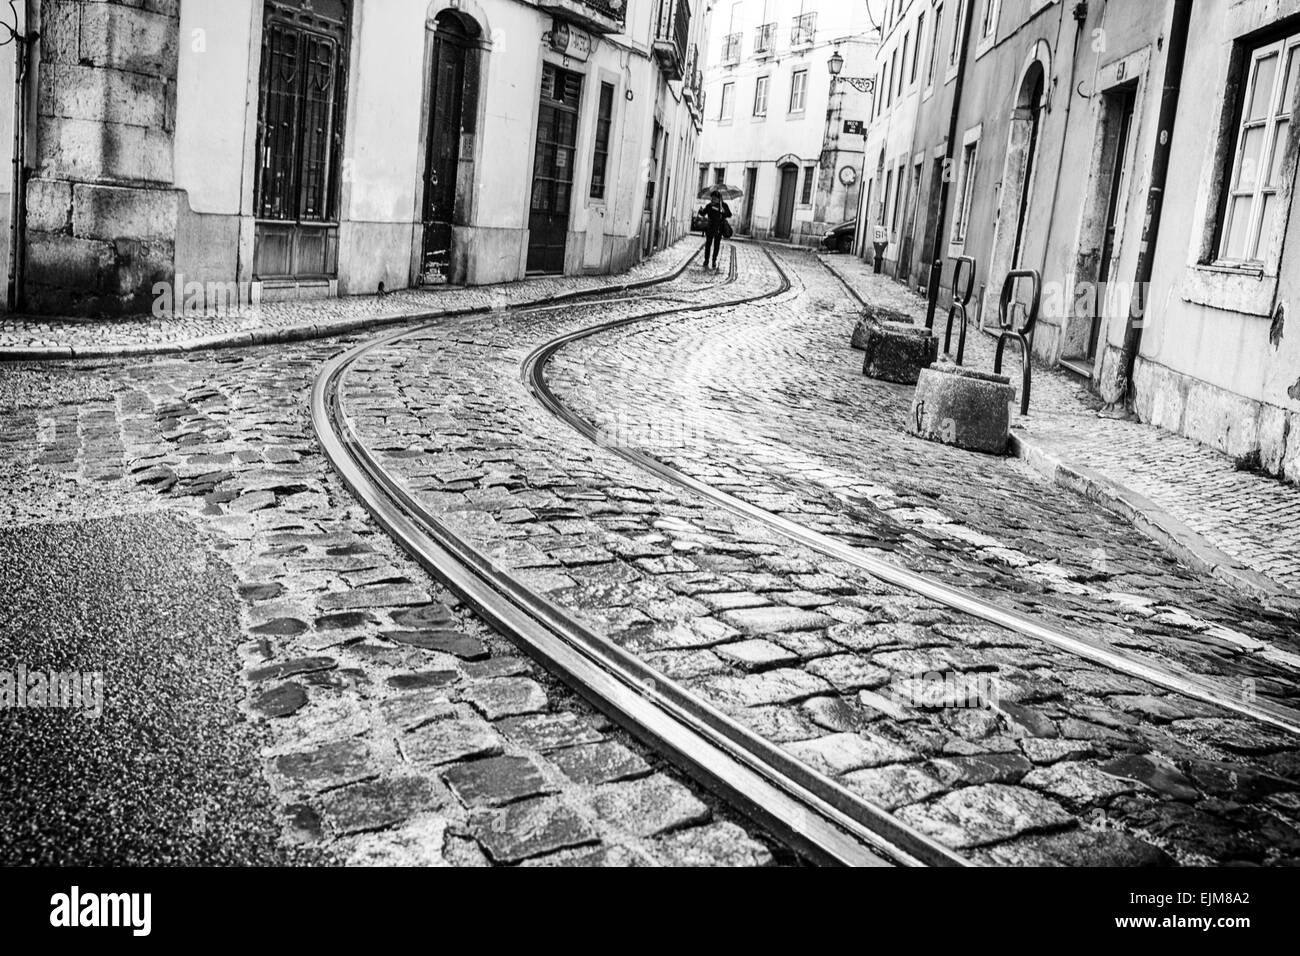 Tram tracks, Alfama, Lisbon - Stock Image